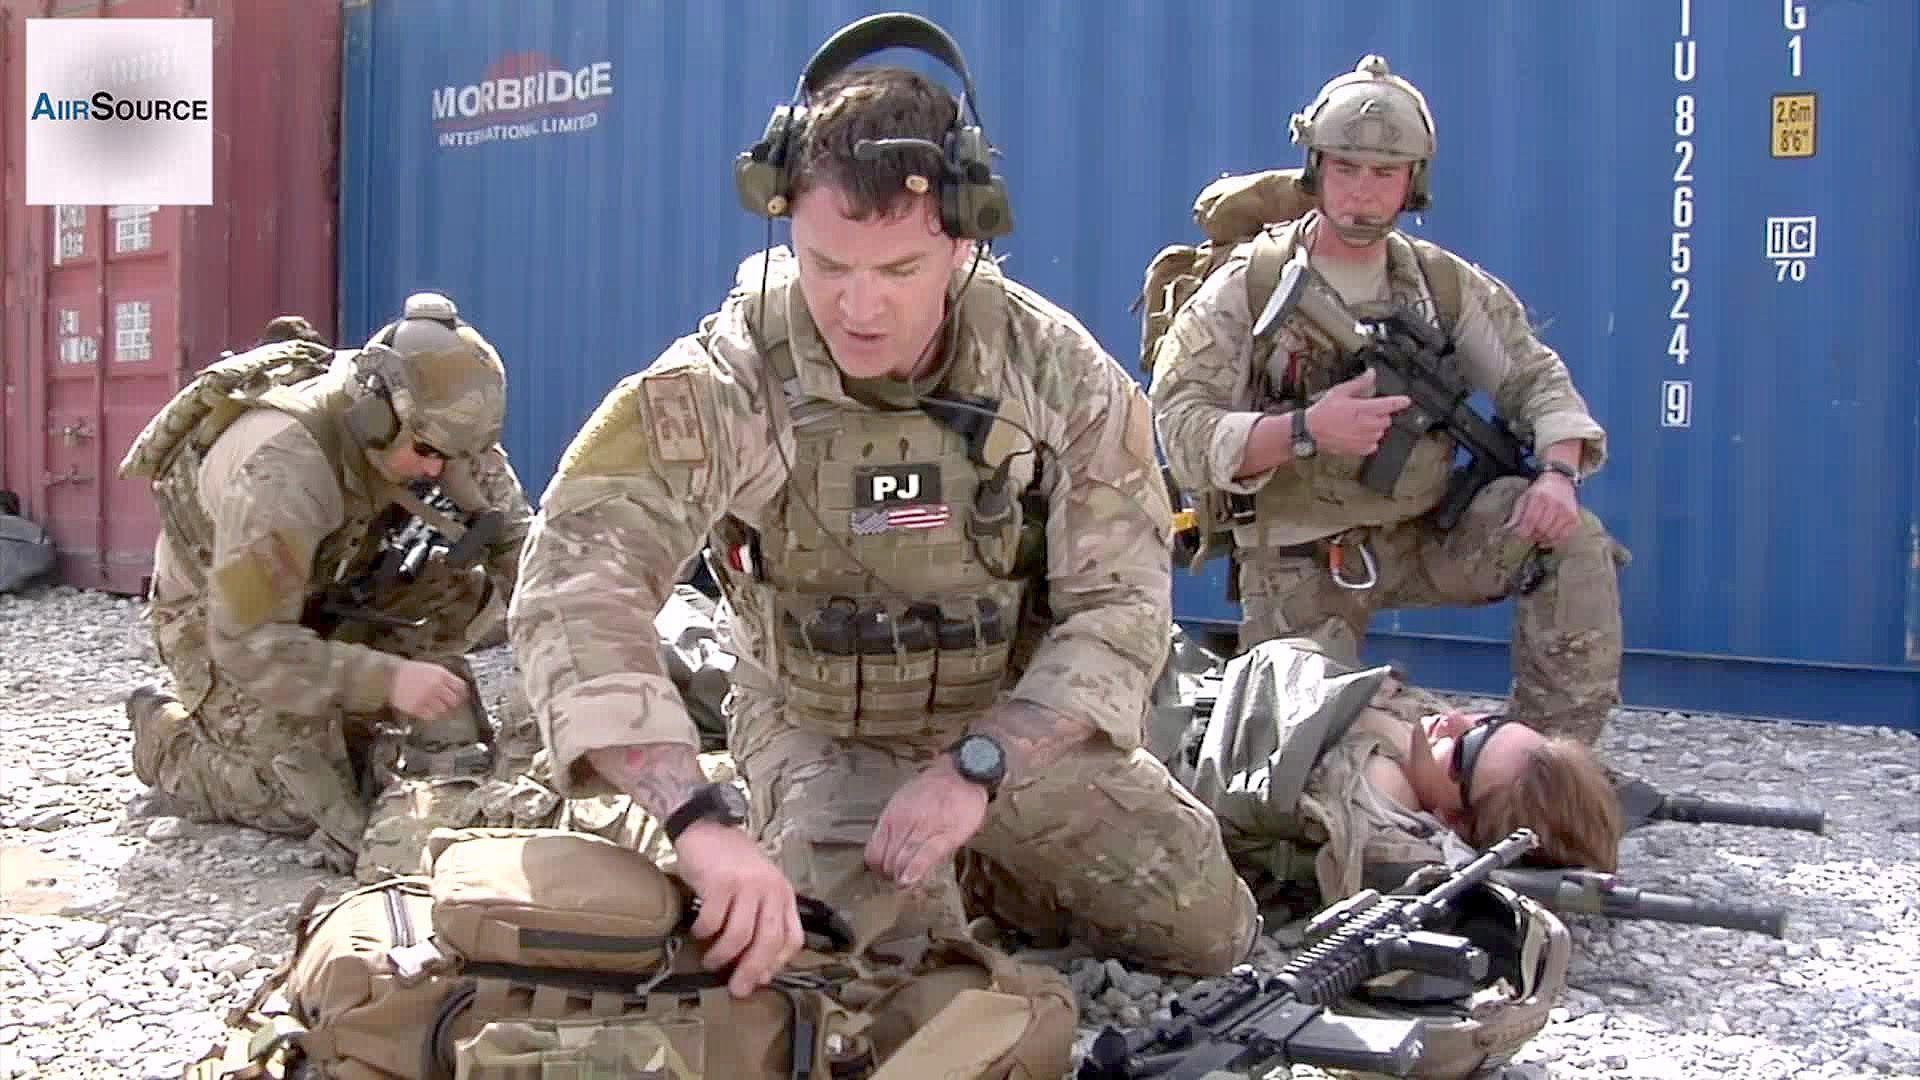 Usaf Pararescuemen Train In Afghanistan Navy Seal Training Air